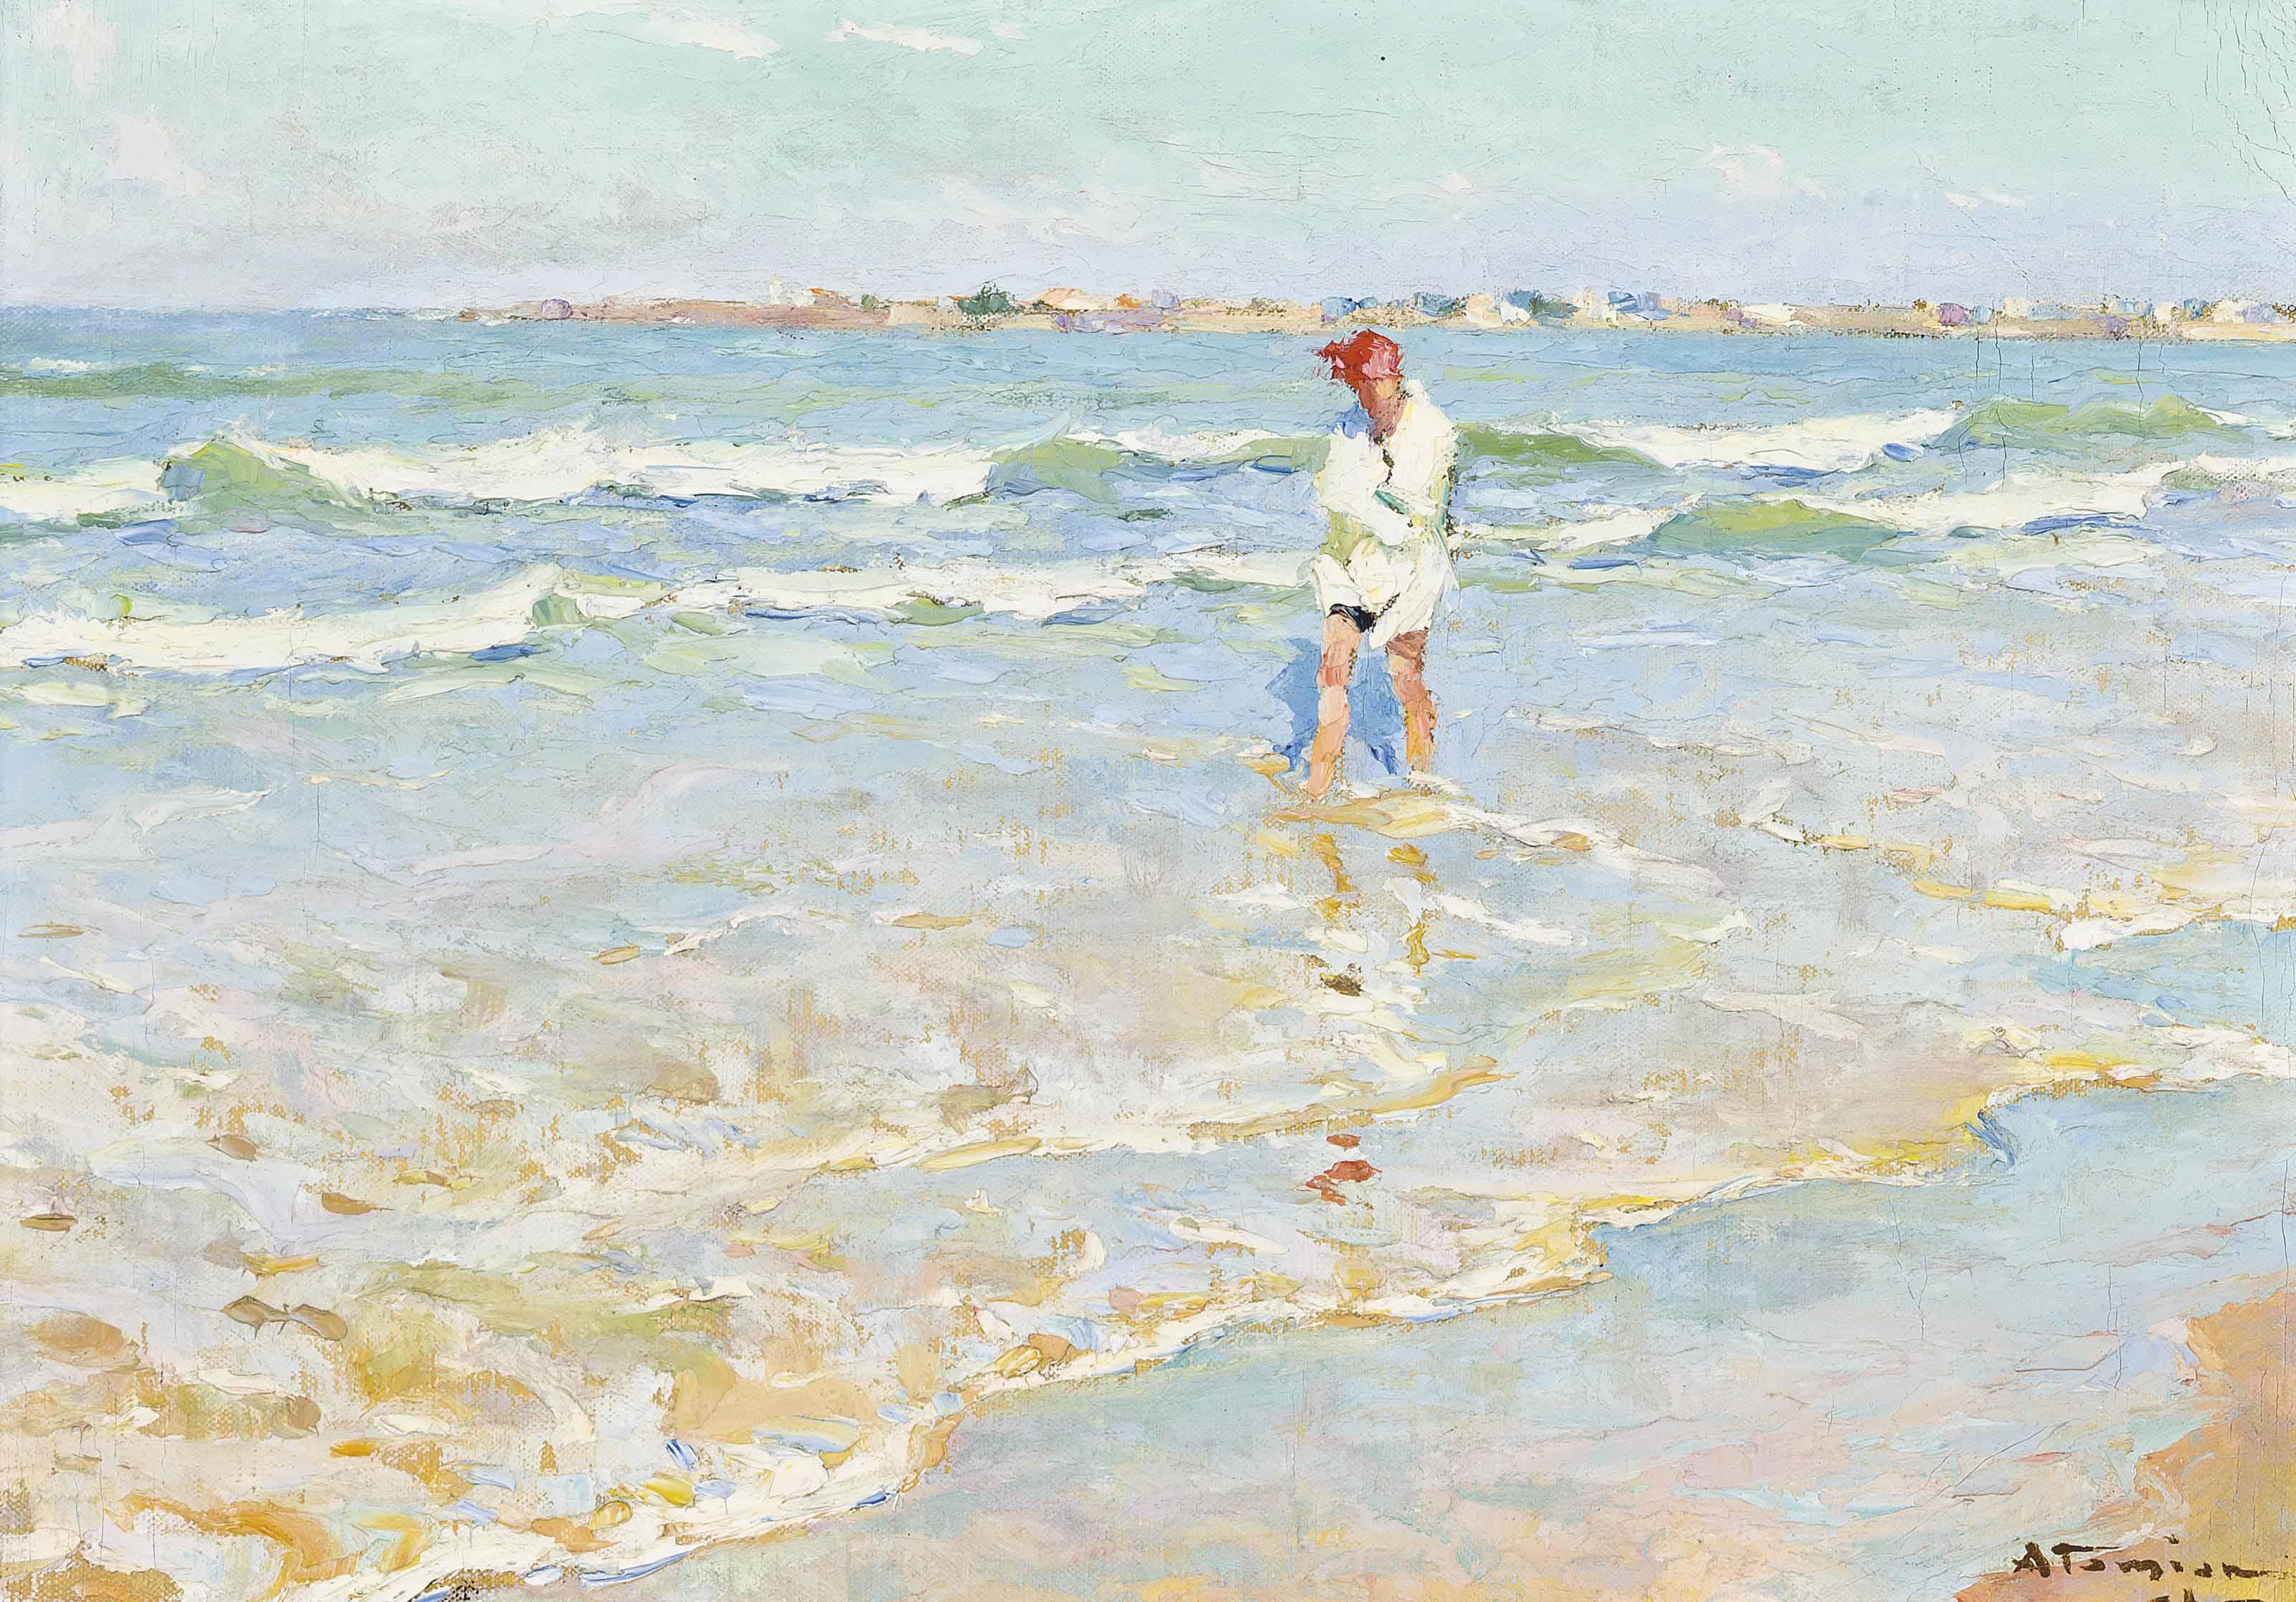 On the shore, possibly Saint-Gilles-sur-Vie, France